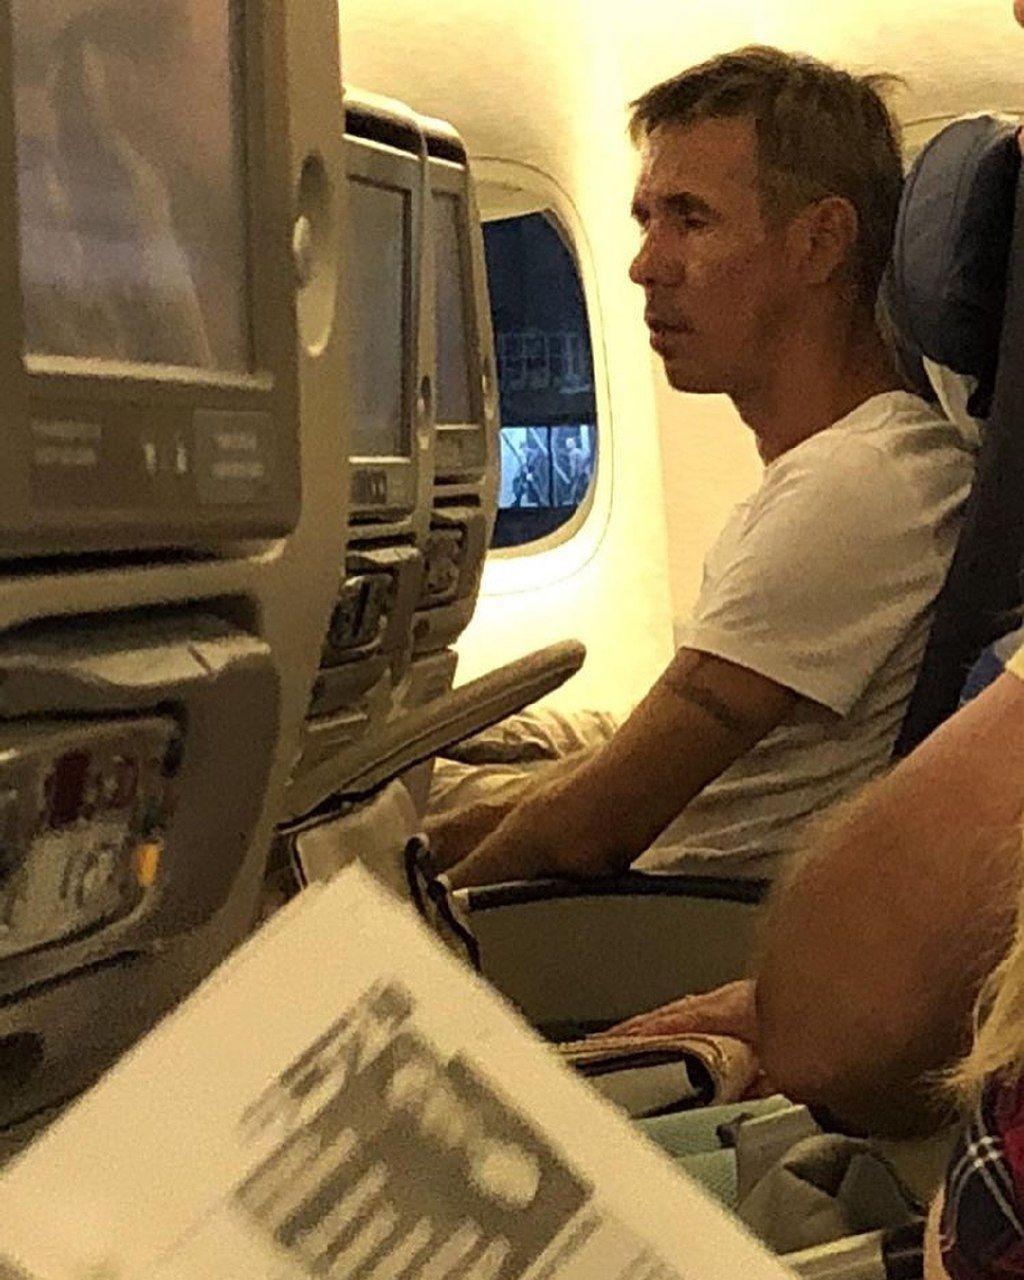 З-за неадекватної поведінки актора літак не зміг злетіти / Telegram-канал Super